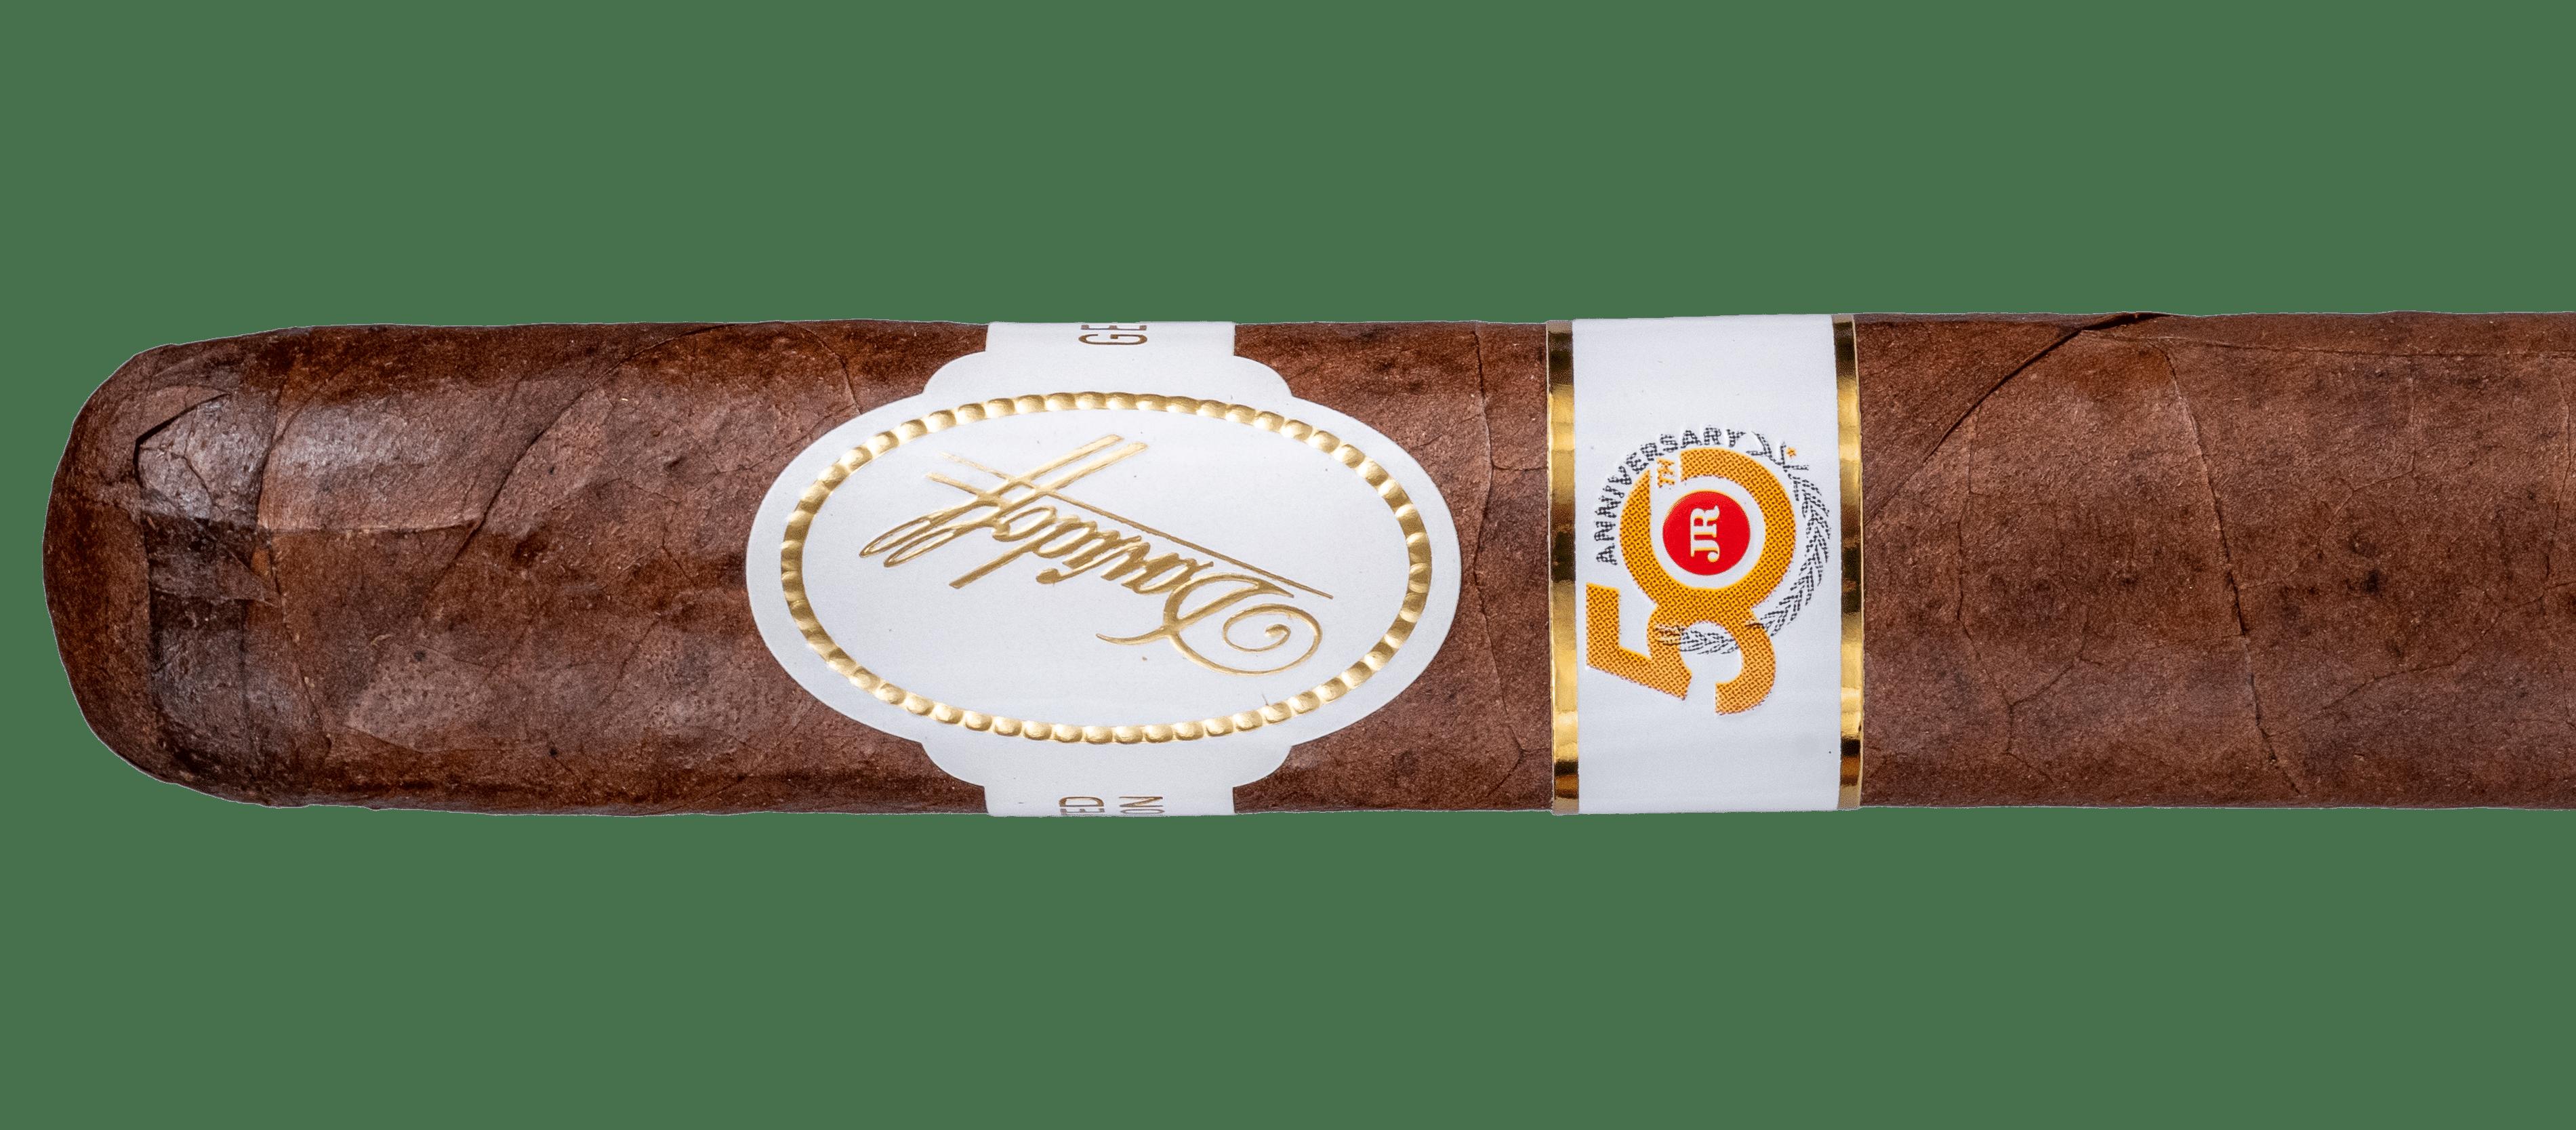 Davidoff JR 50th Anniversary - Blind Cigar Review